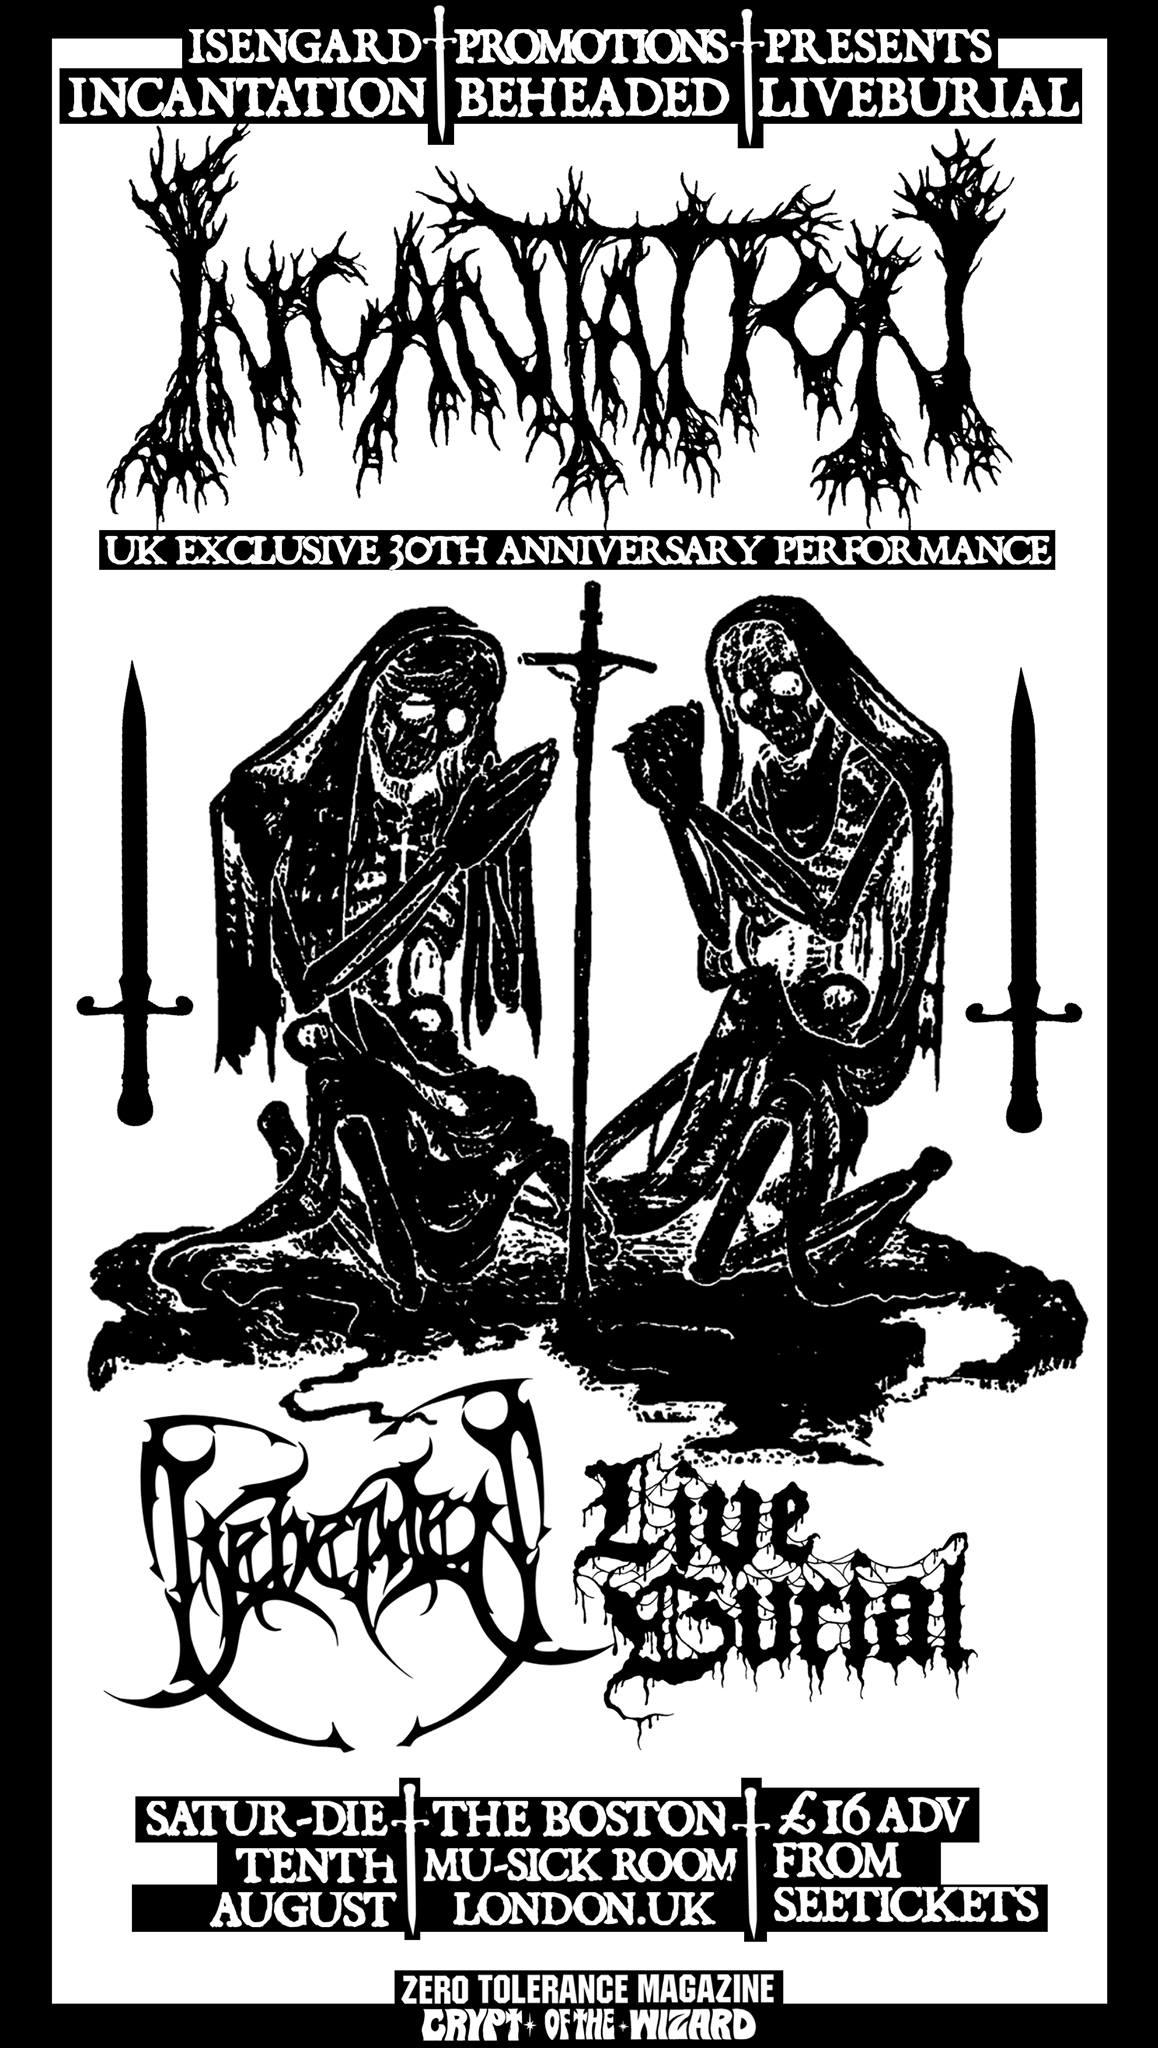 London_2019_incantation_behaded_liveburial.jpg